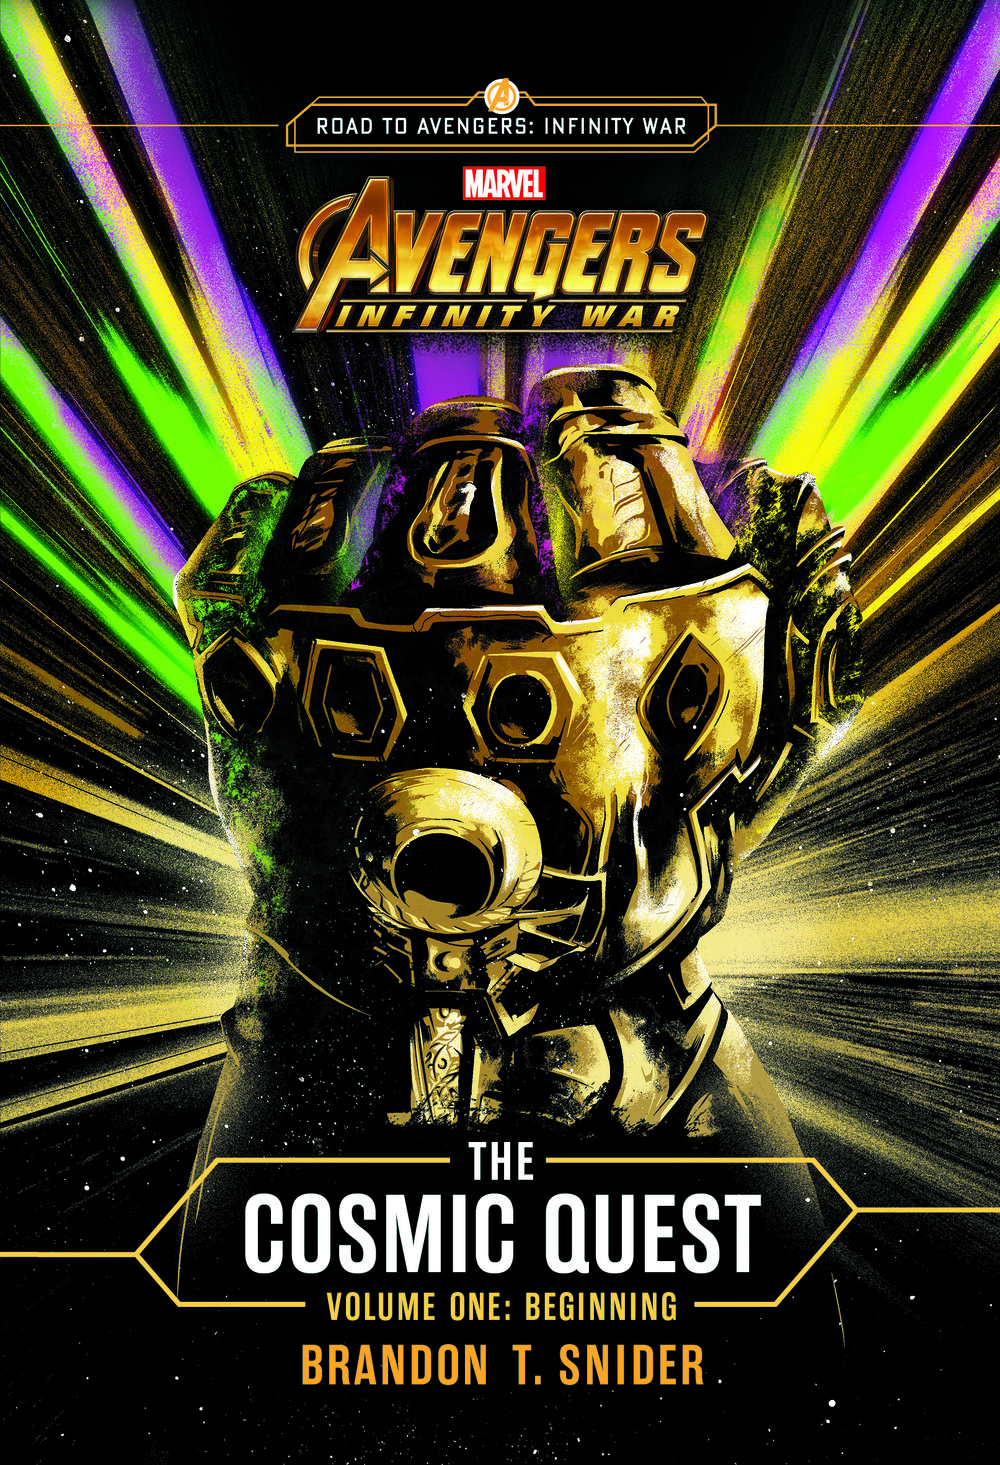 Avengers-Infinity-War-updated-logo.jpg